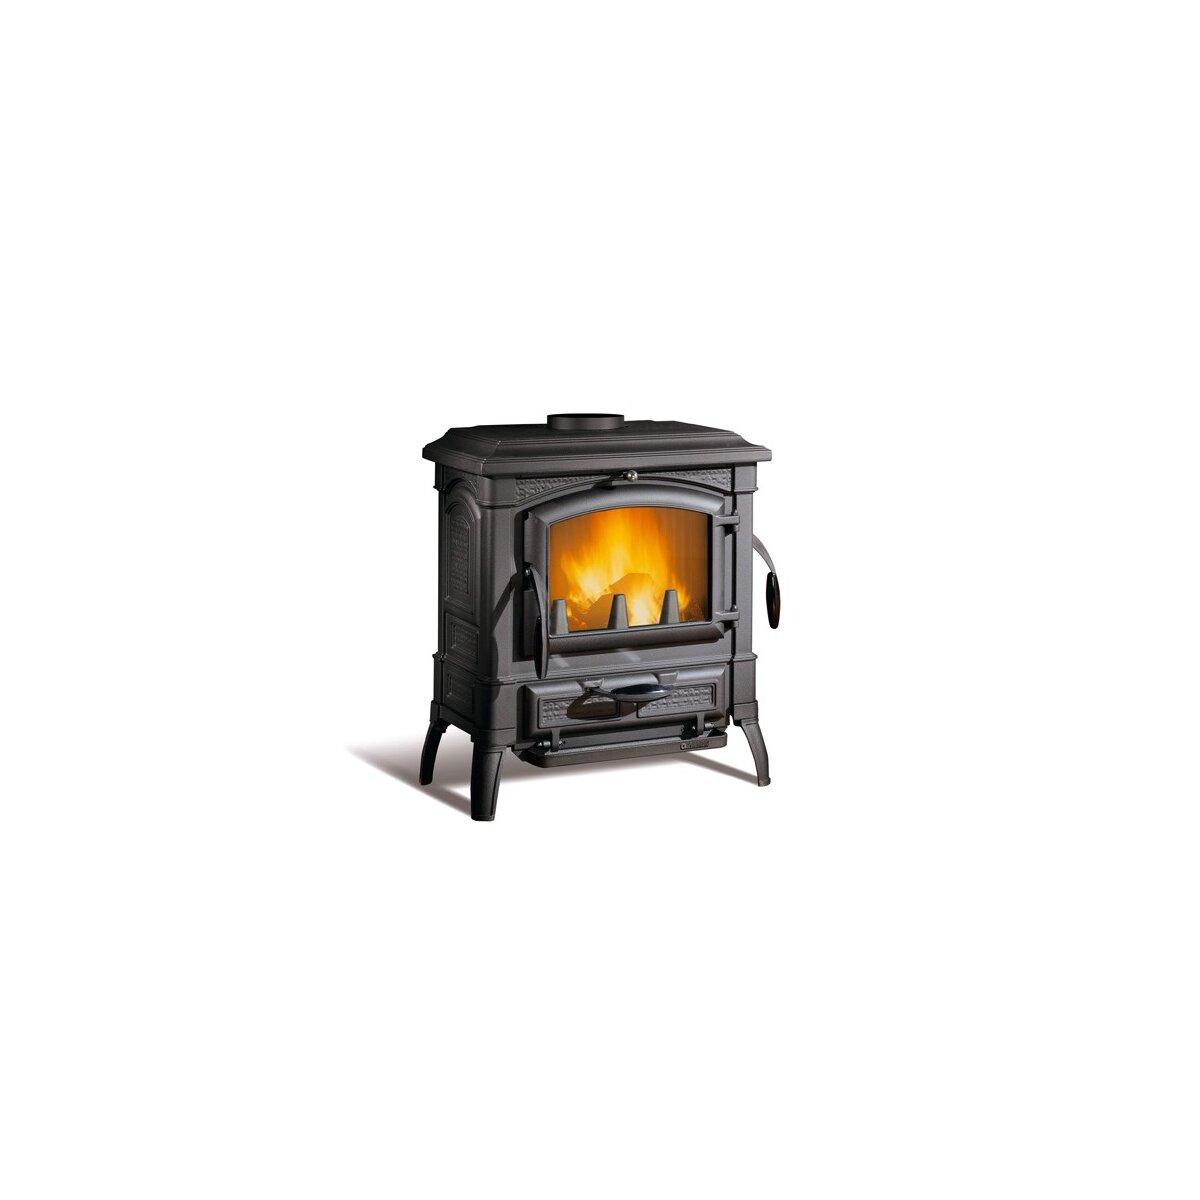 kaminofen gussofen la nordica isetta evo kaufen feuer. Black Bedroom Furniture Sets. Home Design Ideas